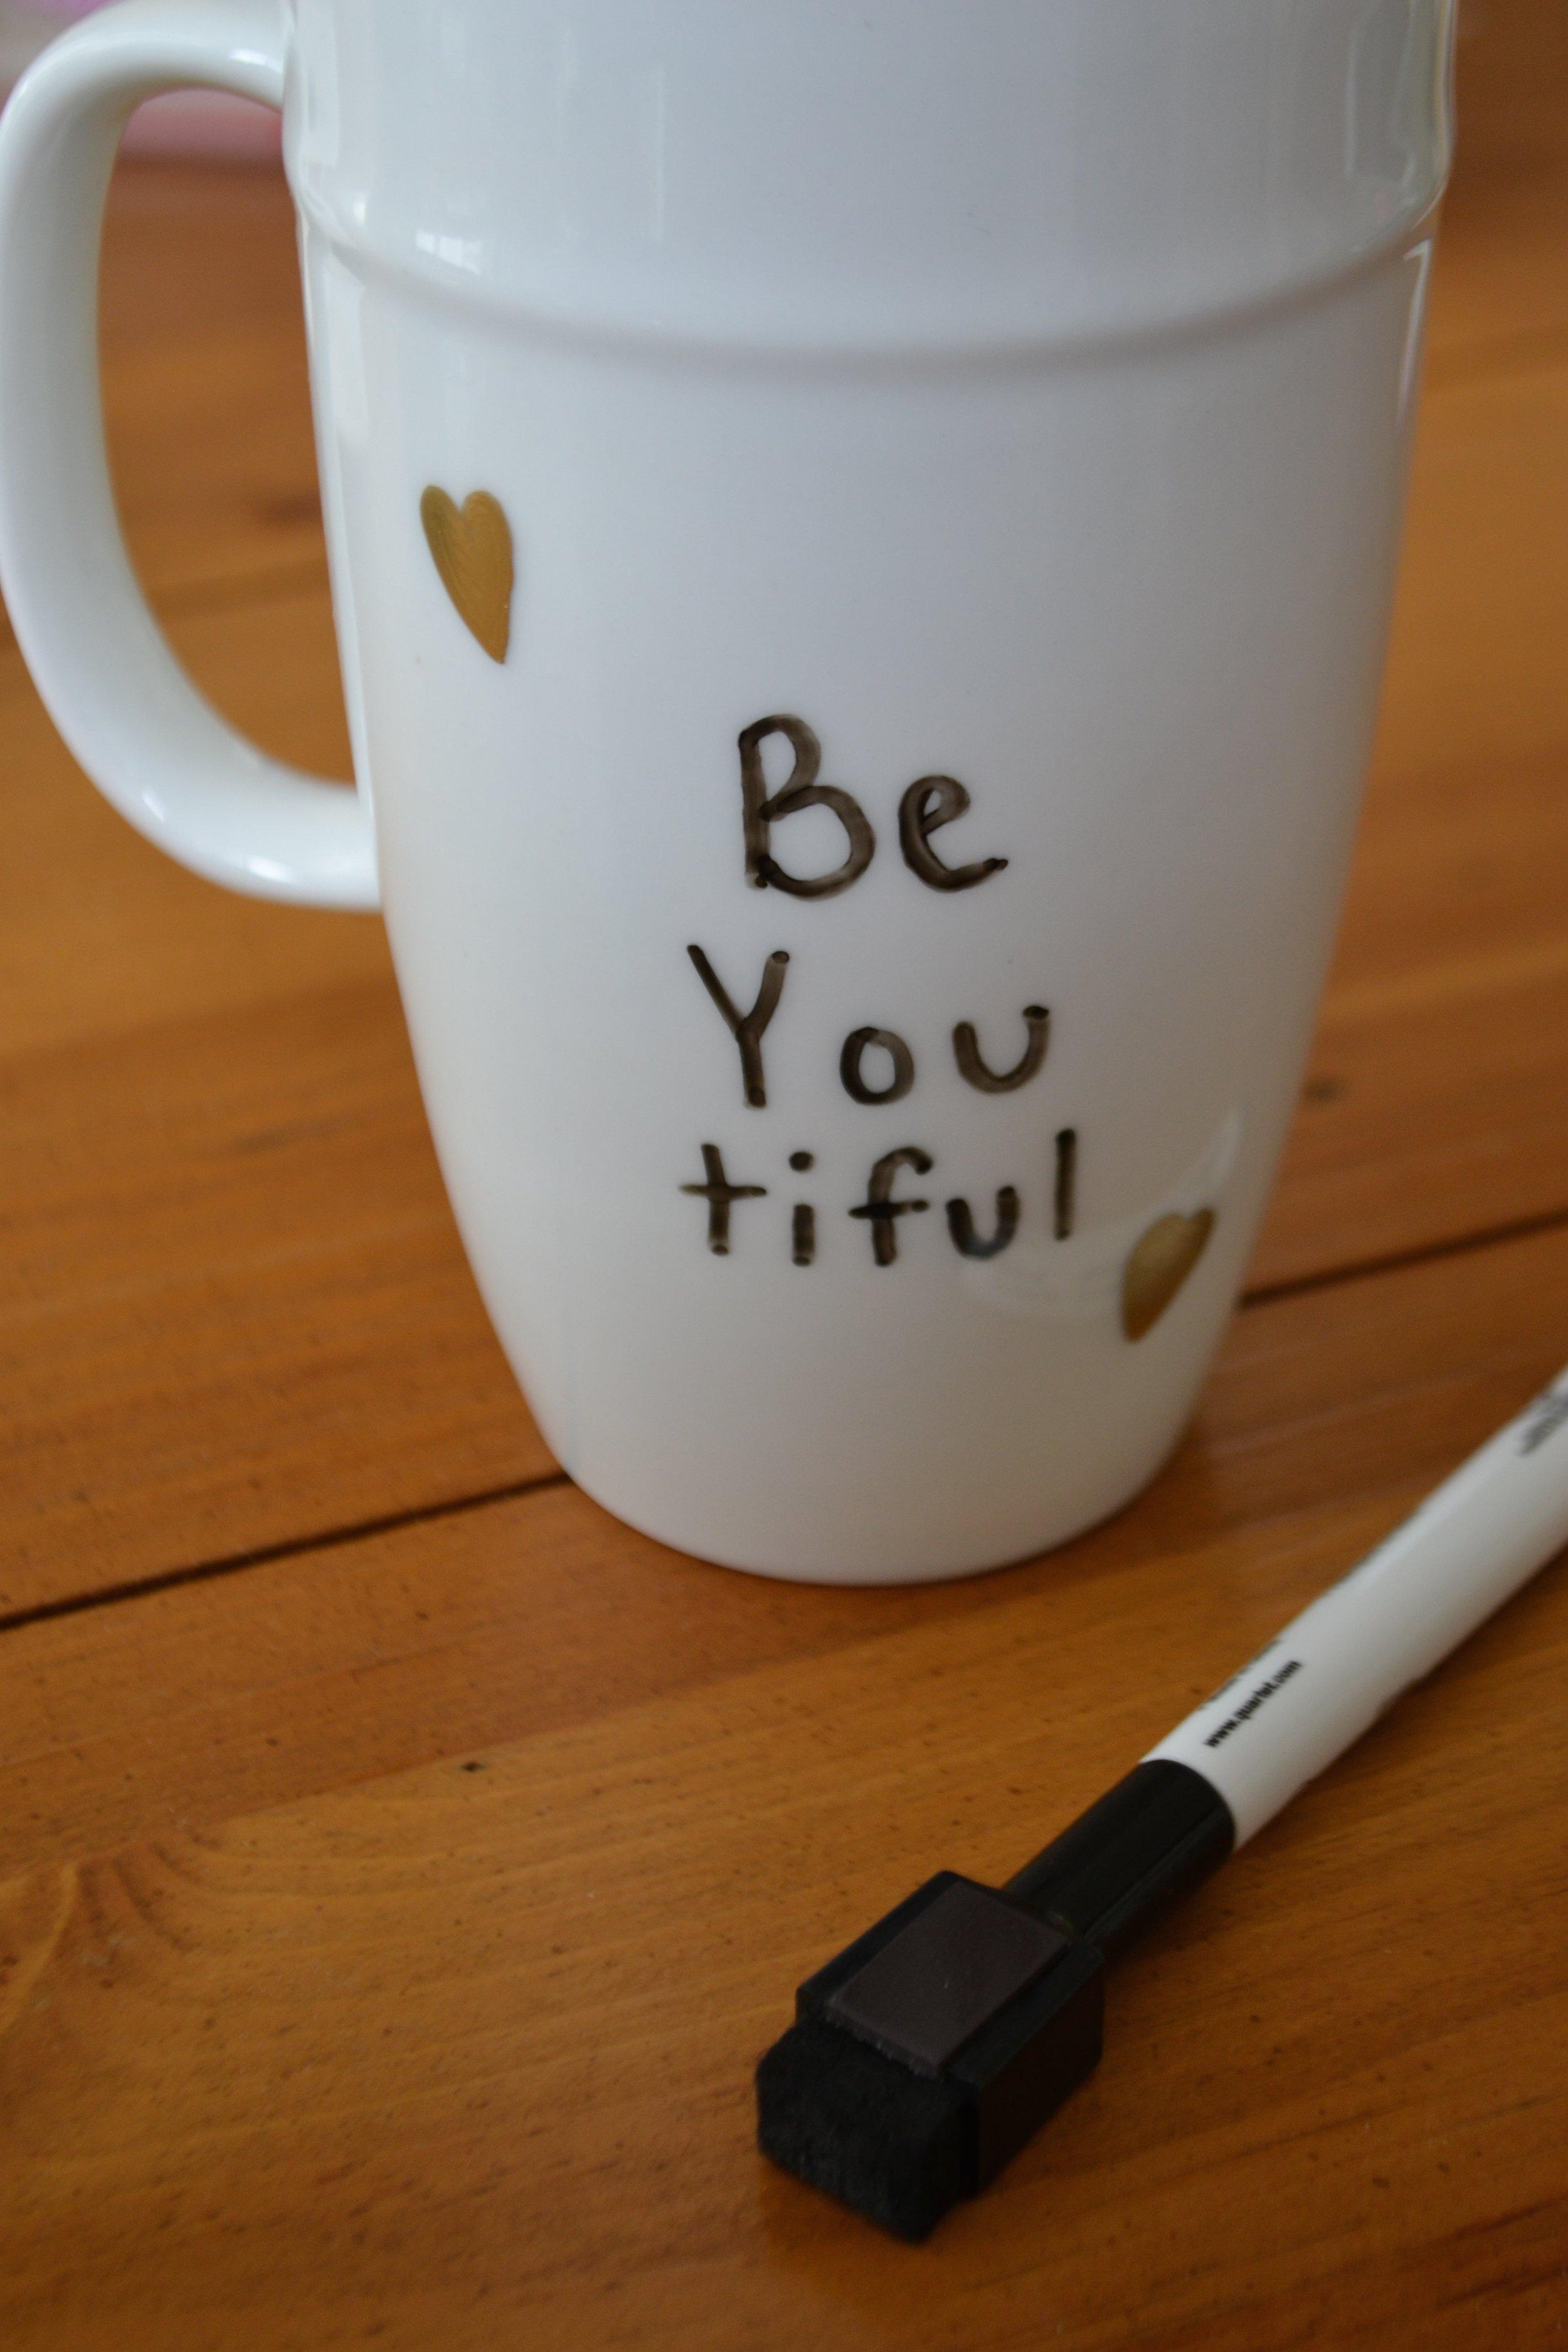 Be You tiful mug quote